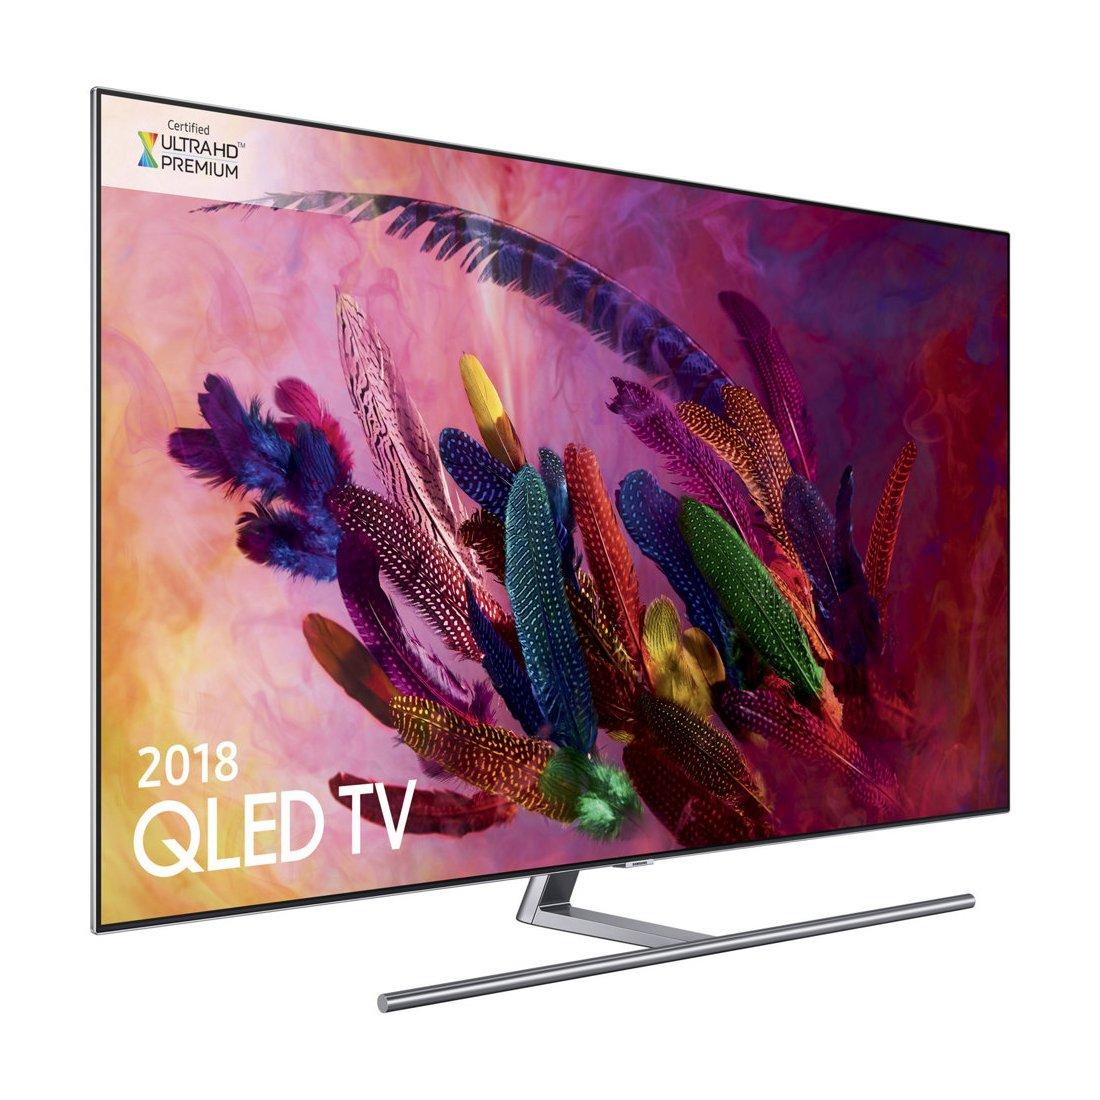 Samsung Qn55q7fnafxzc 55 Class Q7fn Qled Smart 4k Uhd Tv Multi Room Distribution System On Wall Mount Wiring Diagram Qn55q7fna